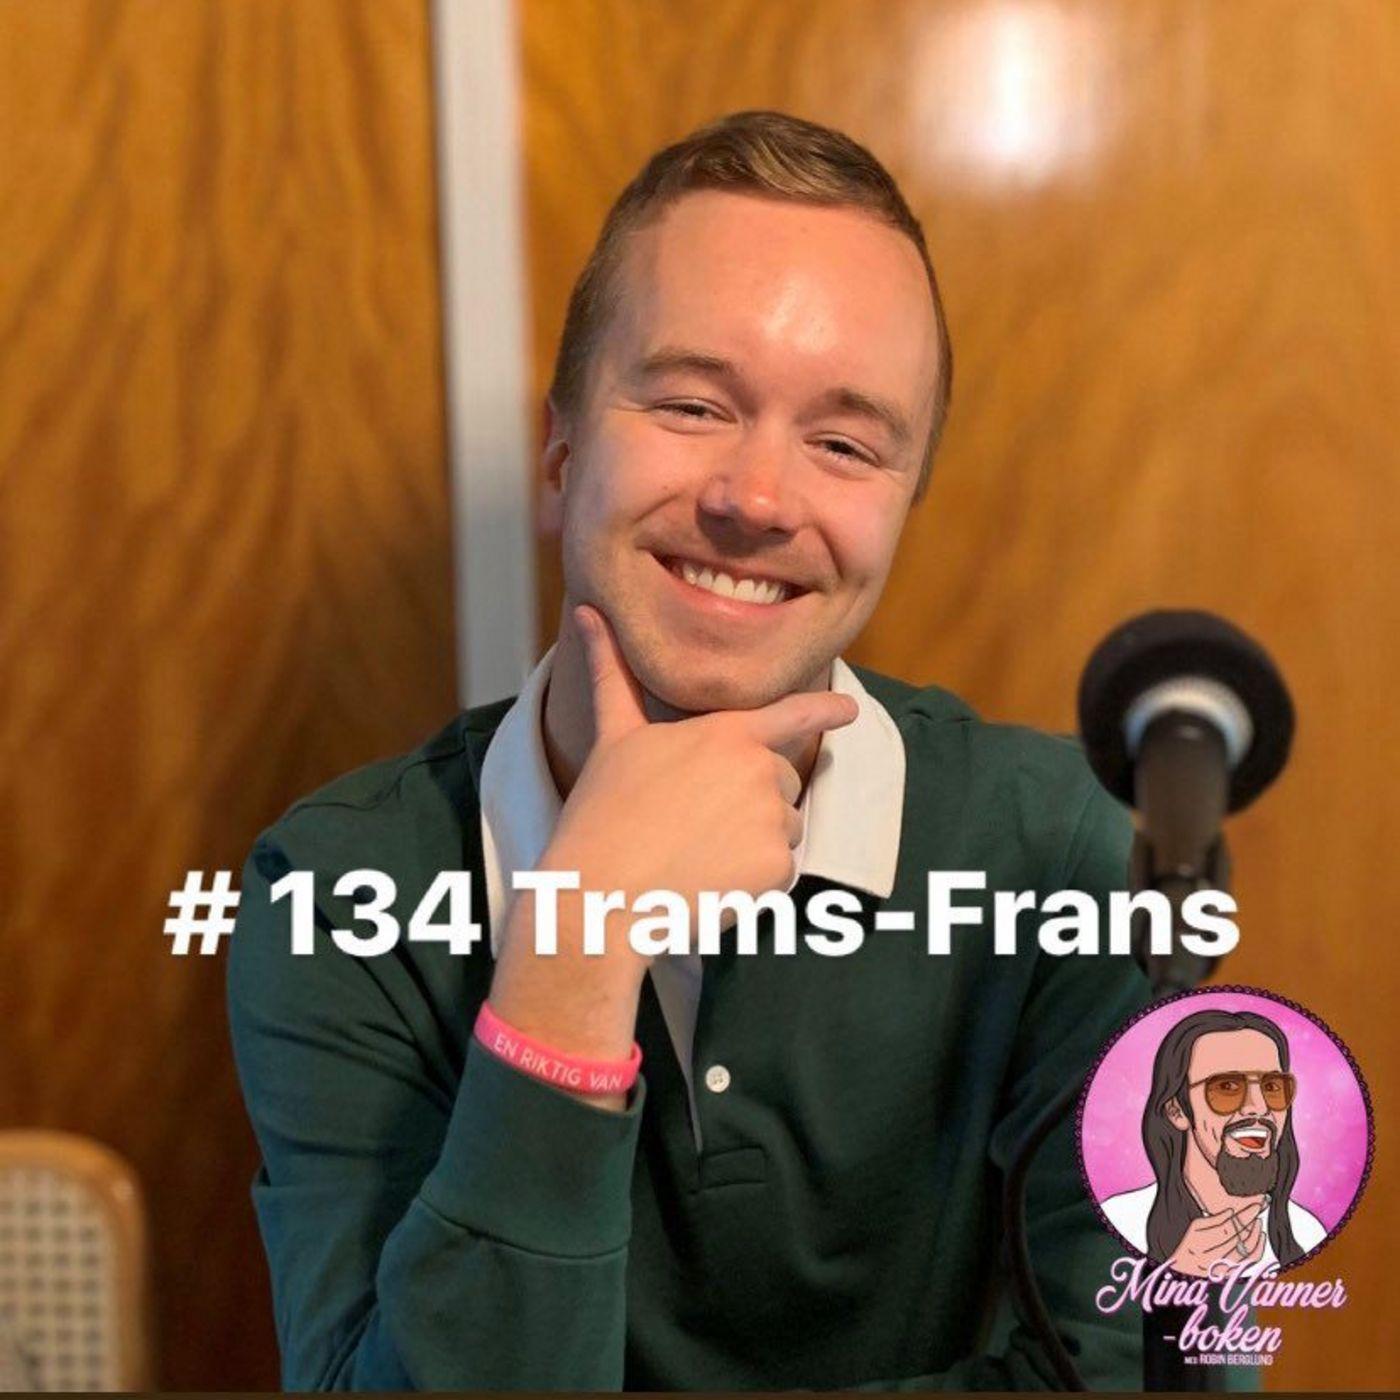 MVB #134 Trams-Frans